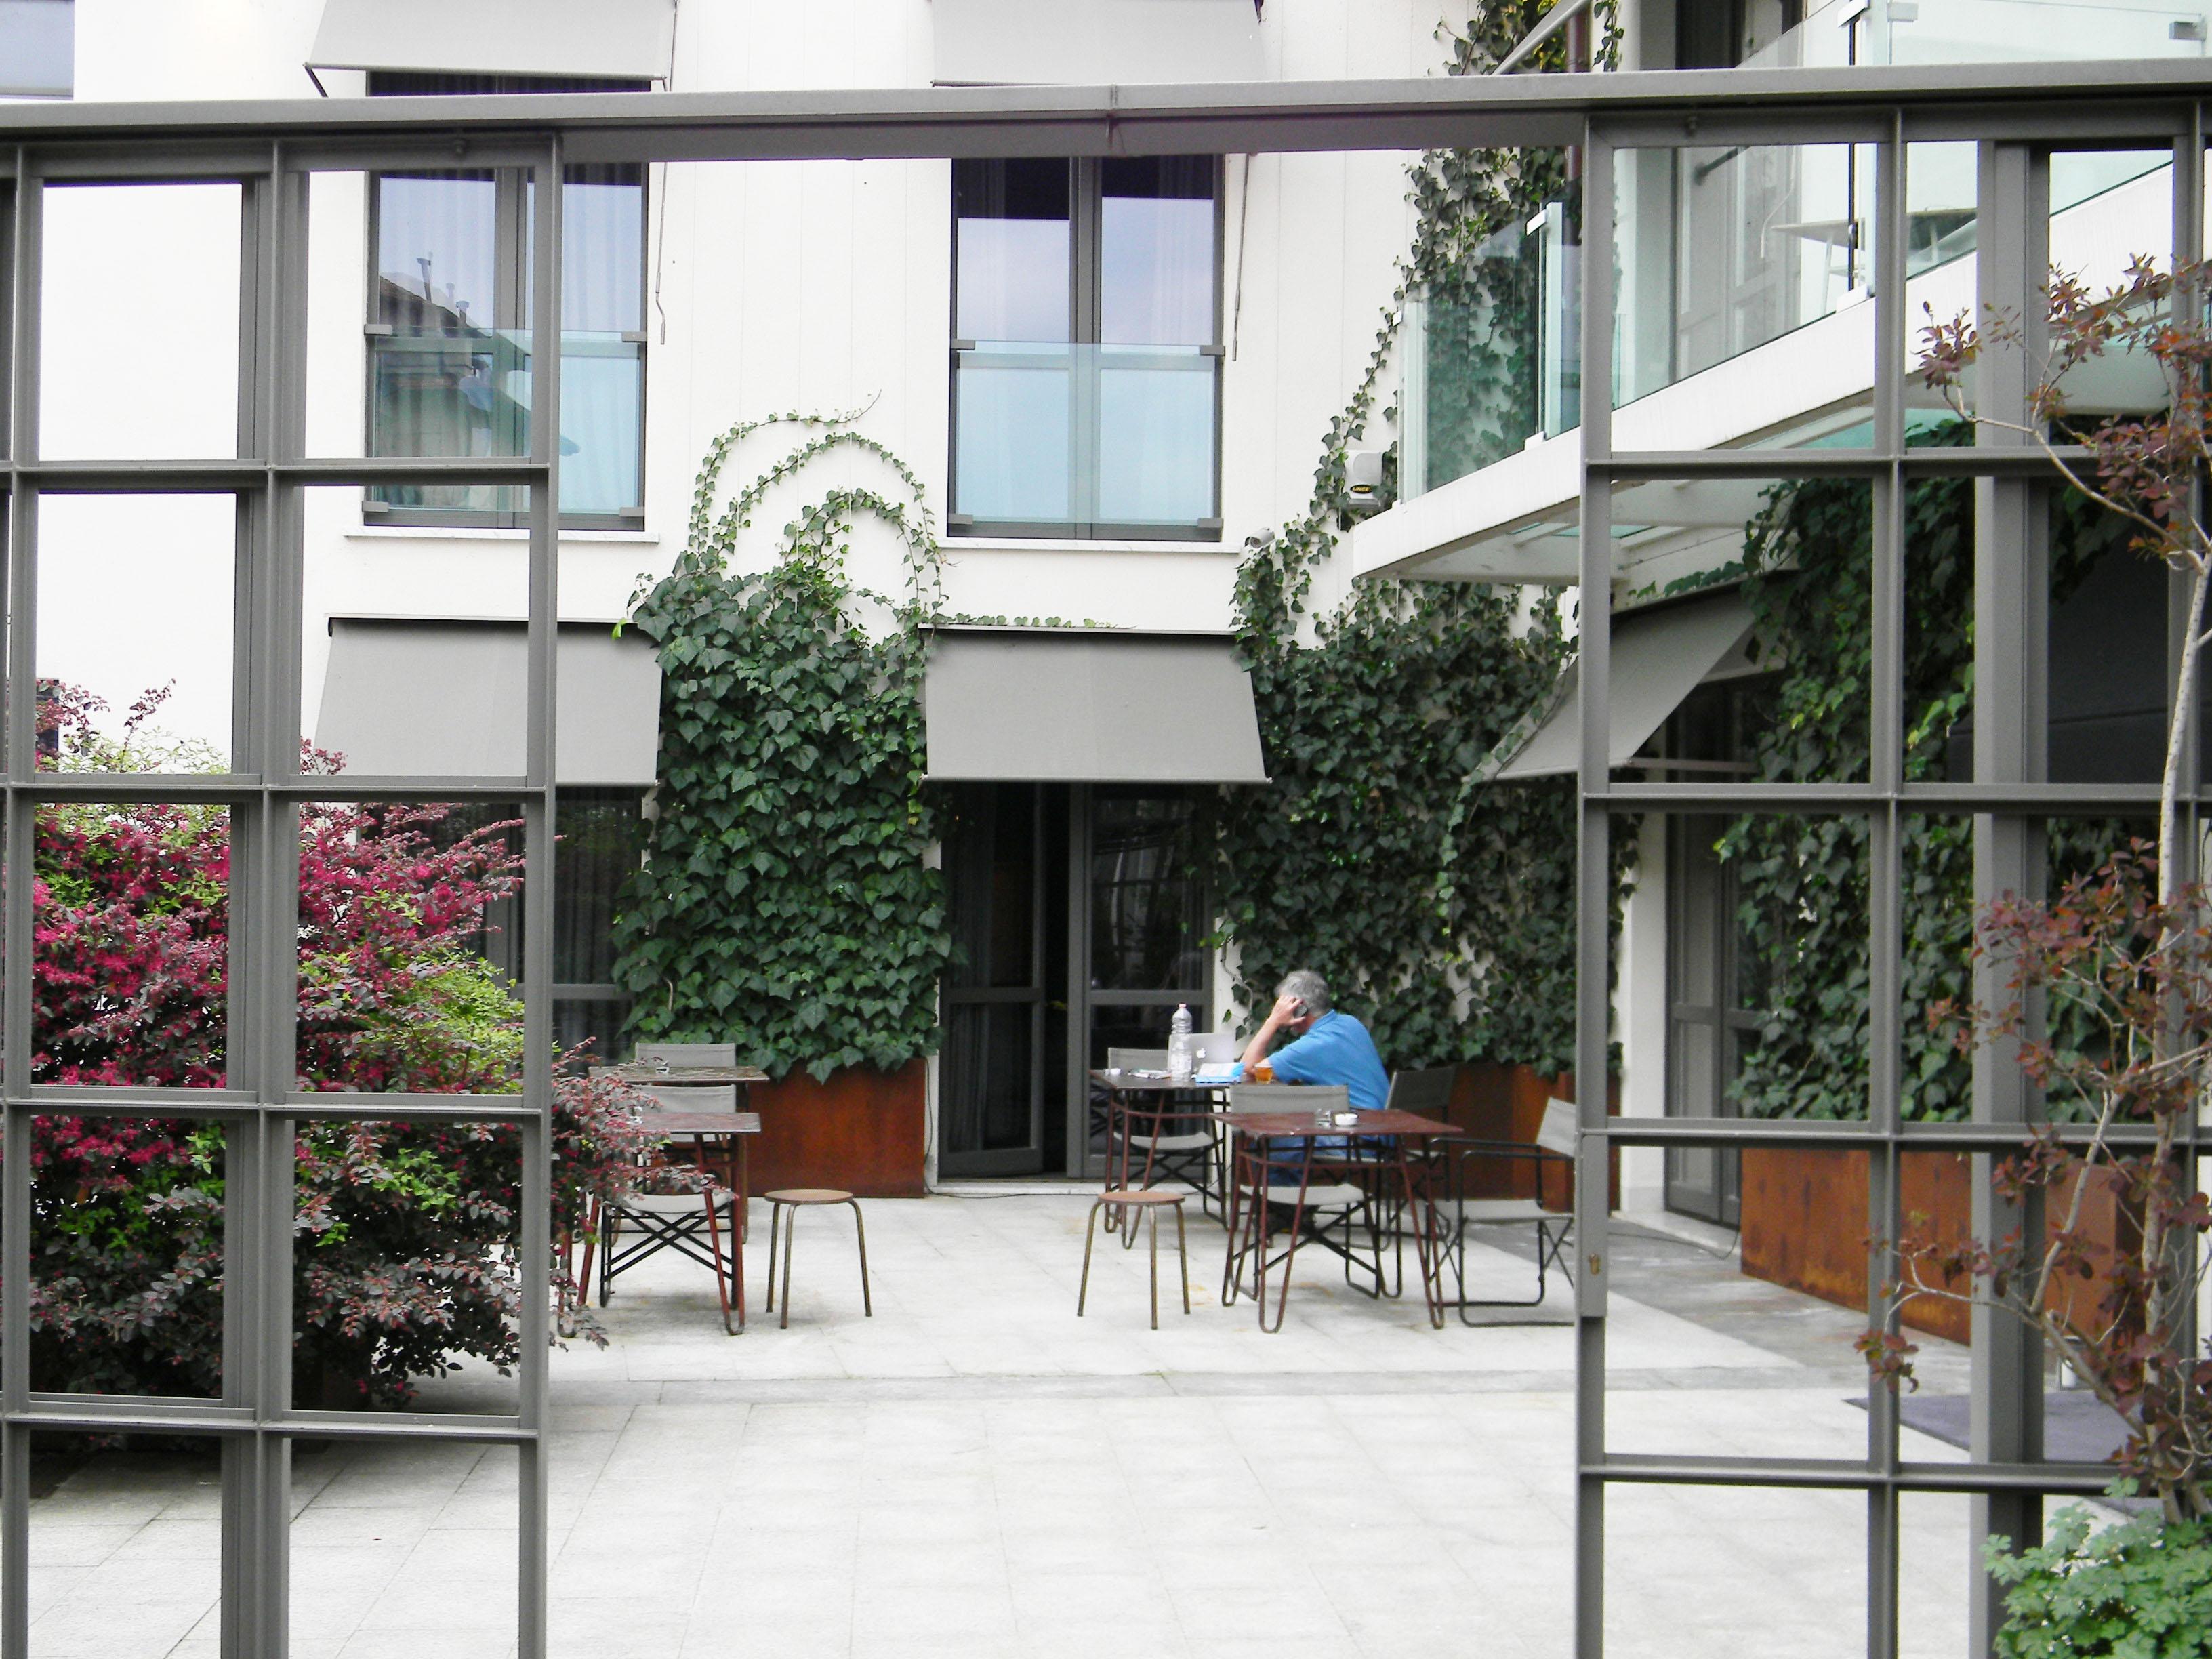 Hotel Borgo Nuovo : Courtyard at hotel borgo nuovo epicurioustravelers